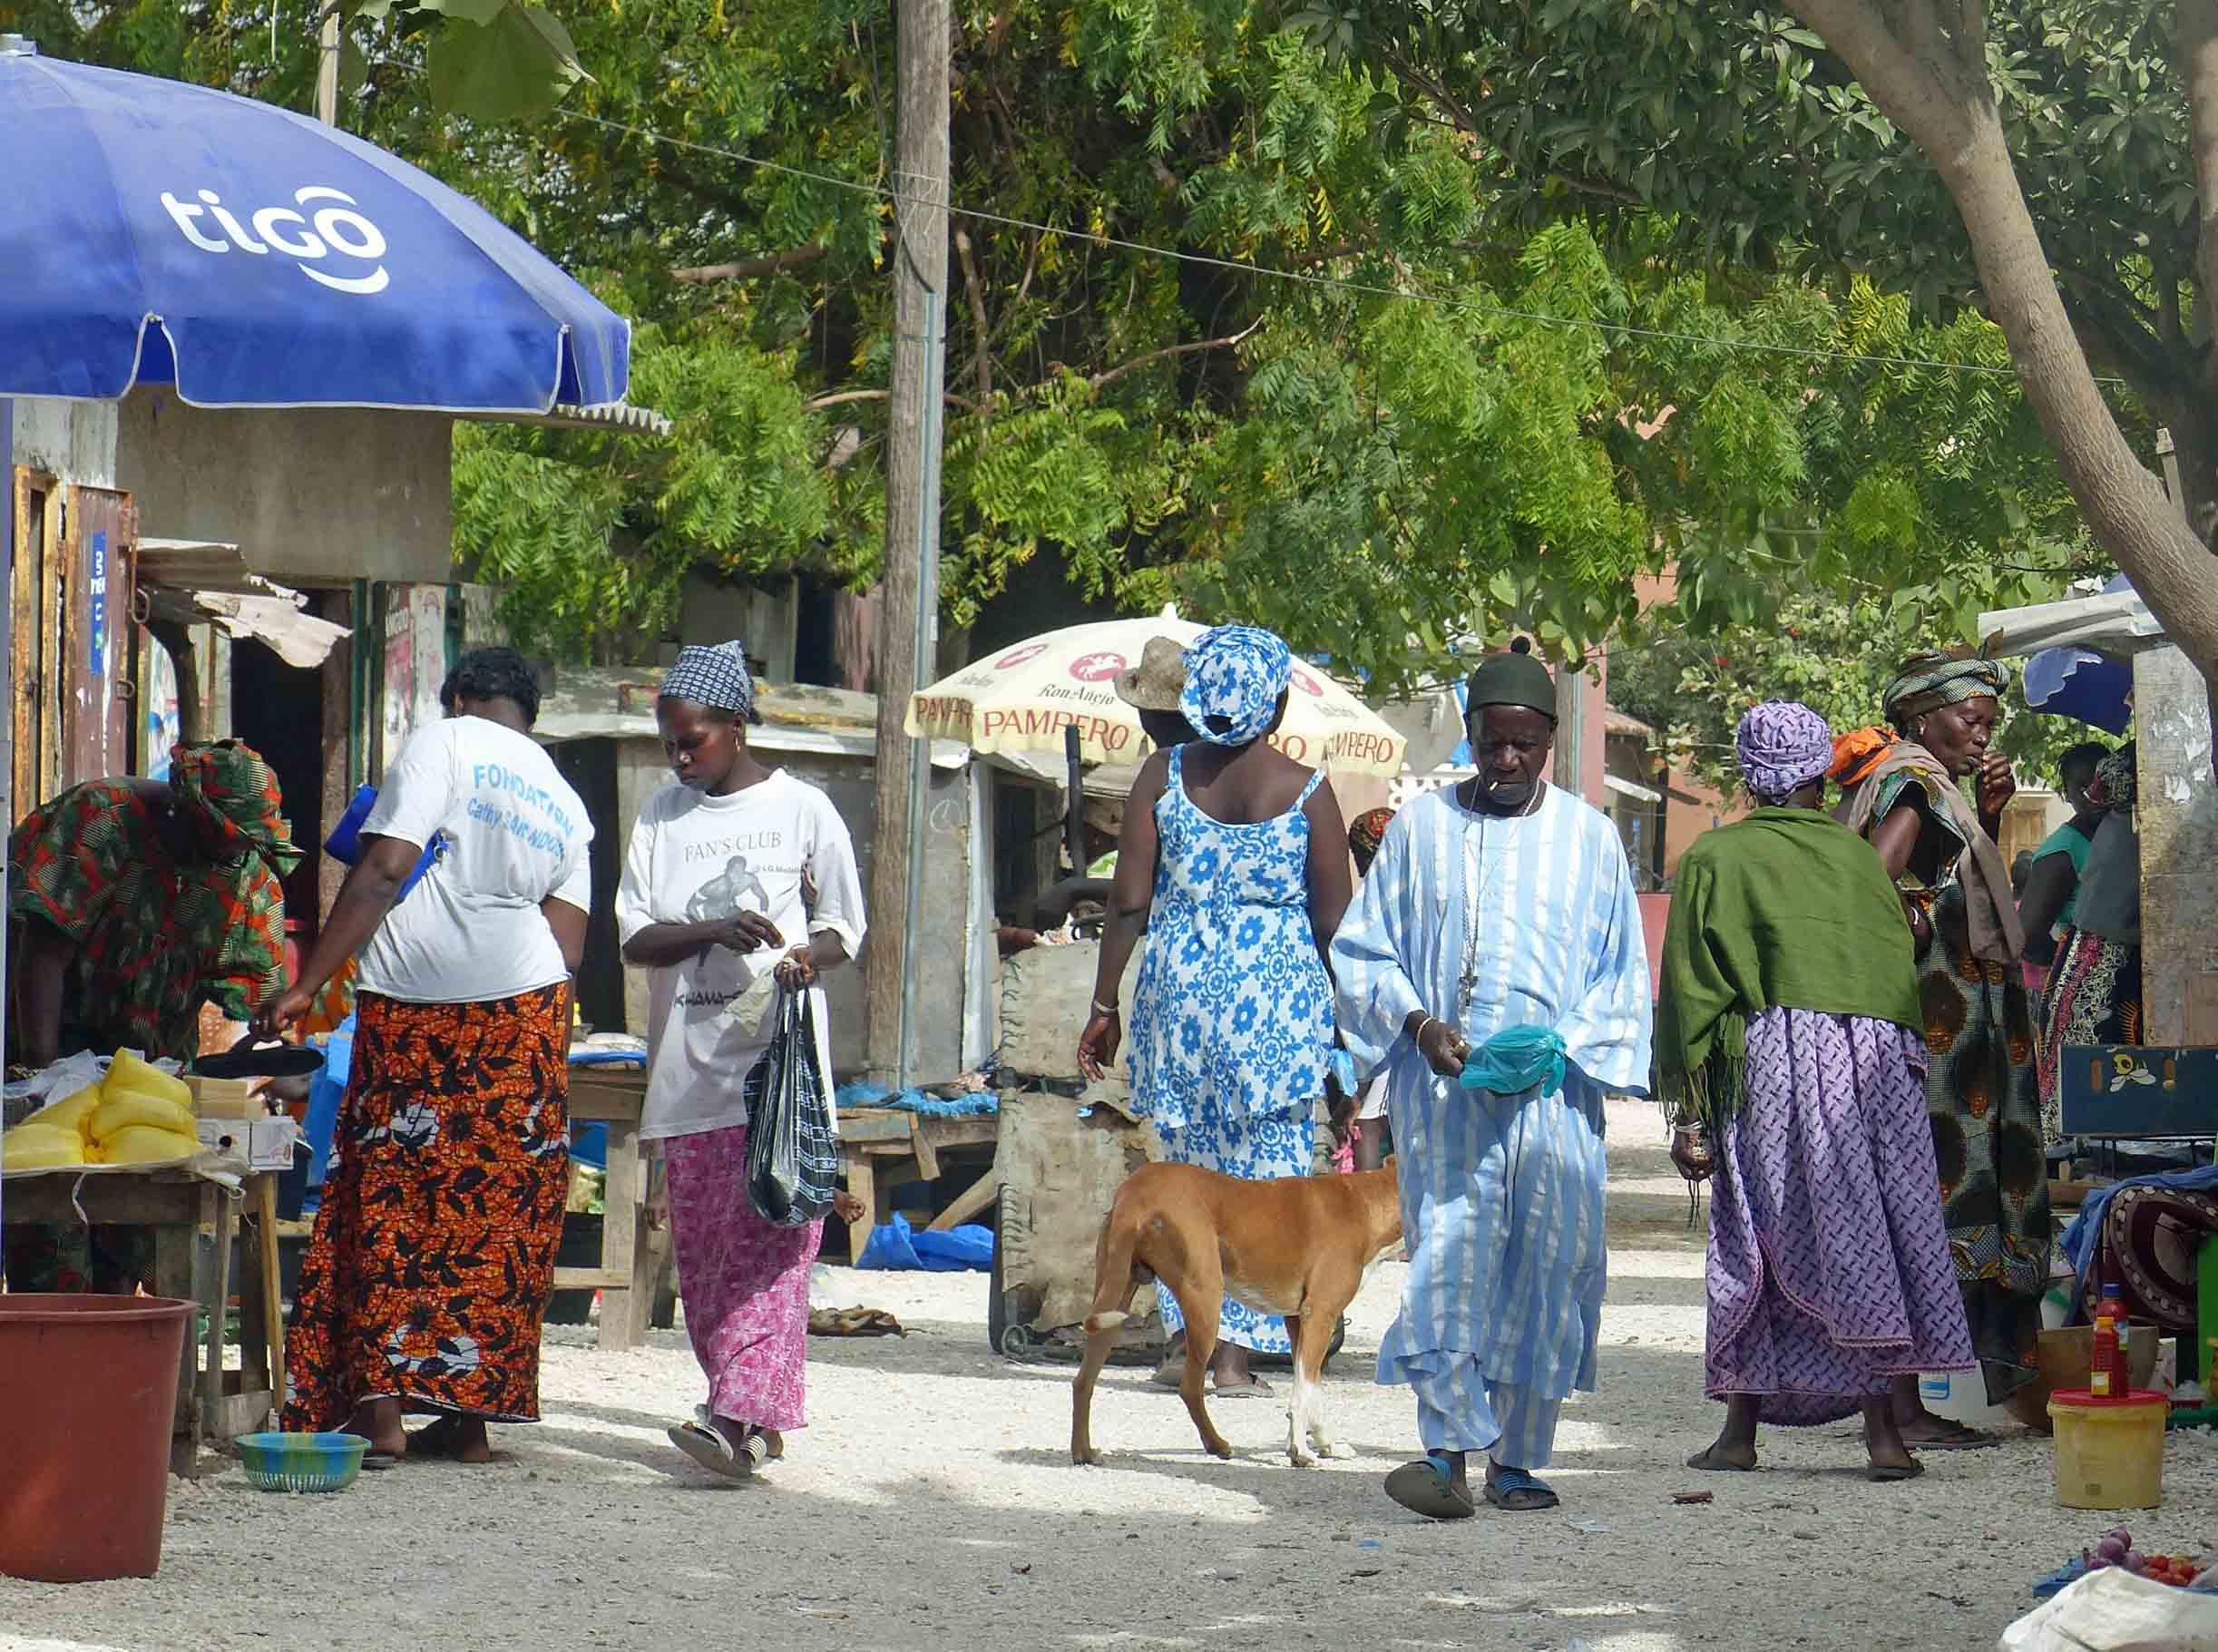 People shopping at stalls